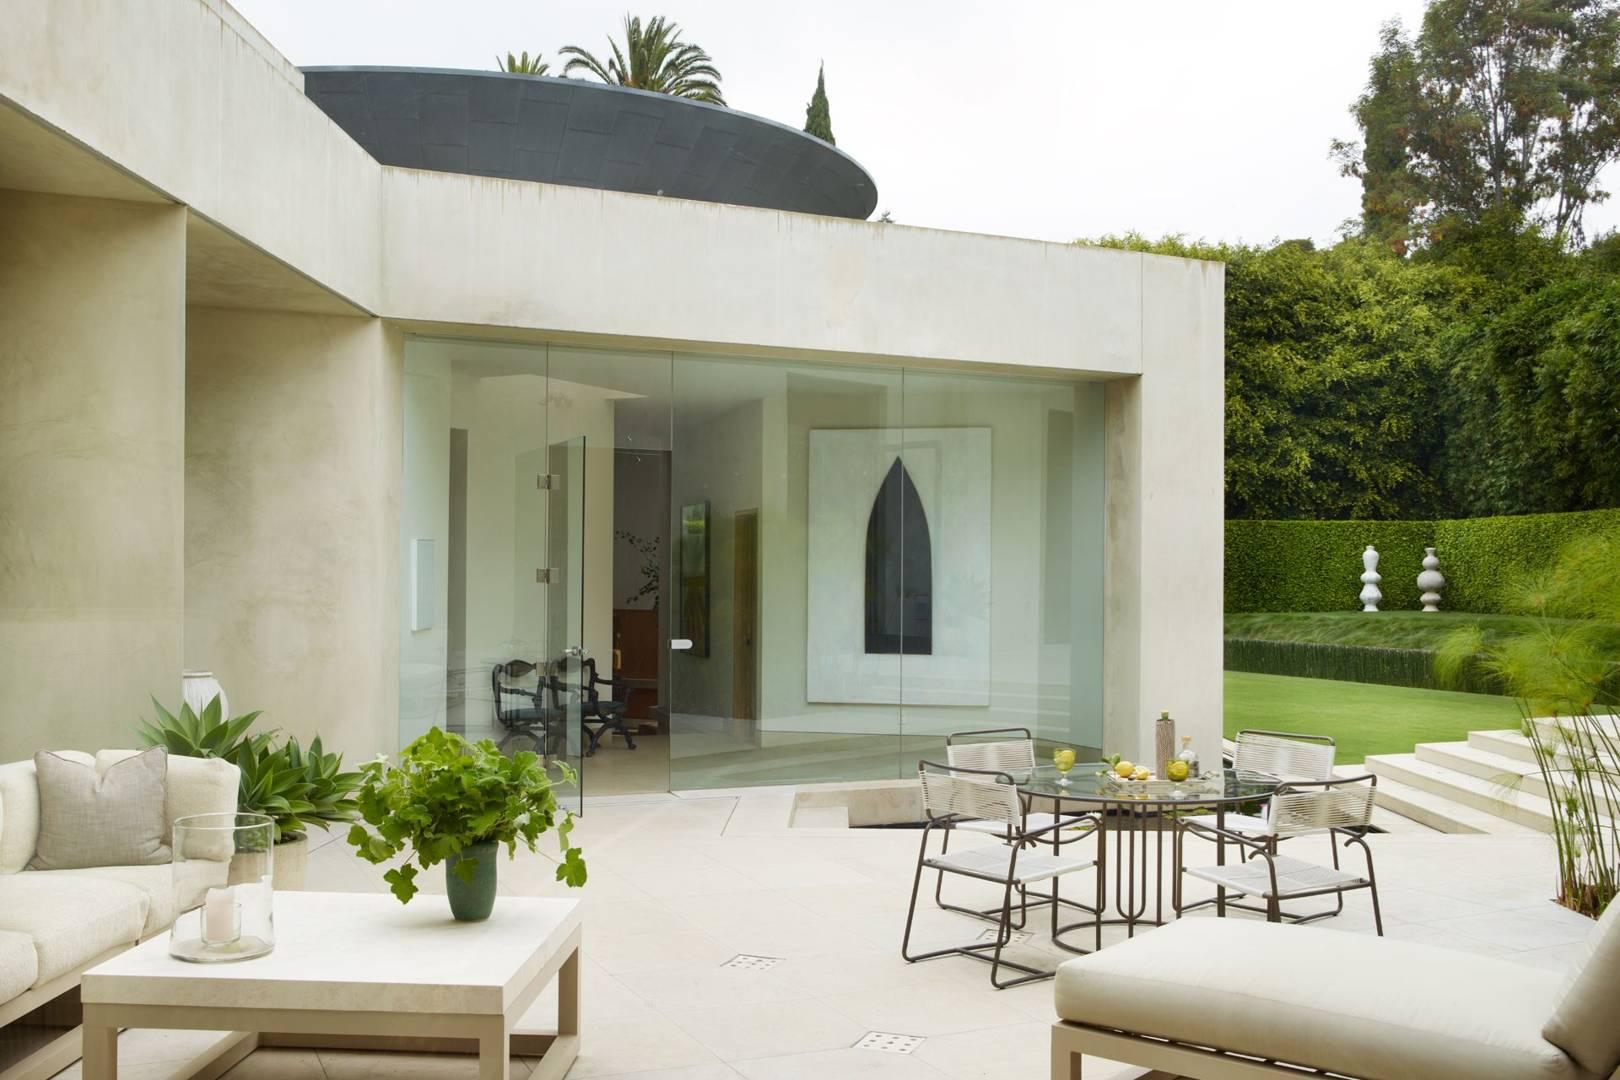 Obama White House Interior Designer Michael S Smiths LA House | House U0026  Garden